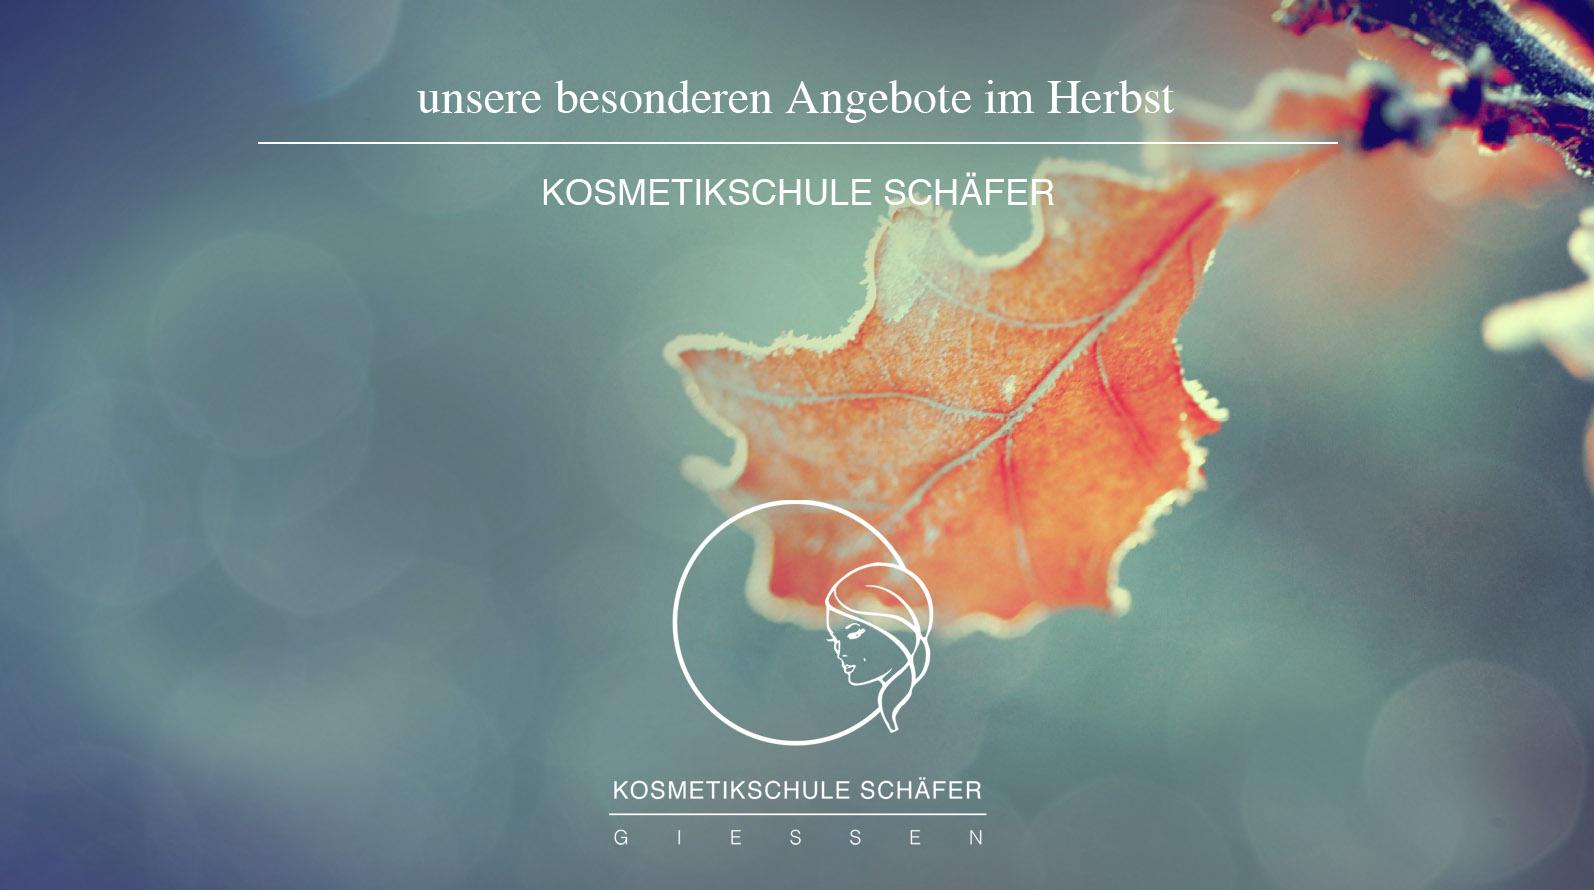 Herbst Angebote - Kosmetikschule Schäfer